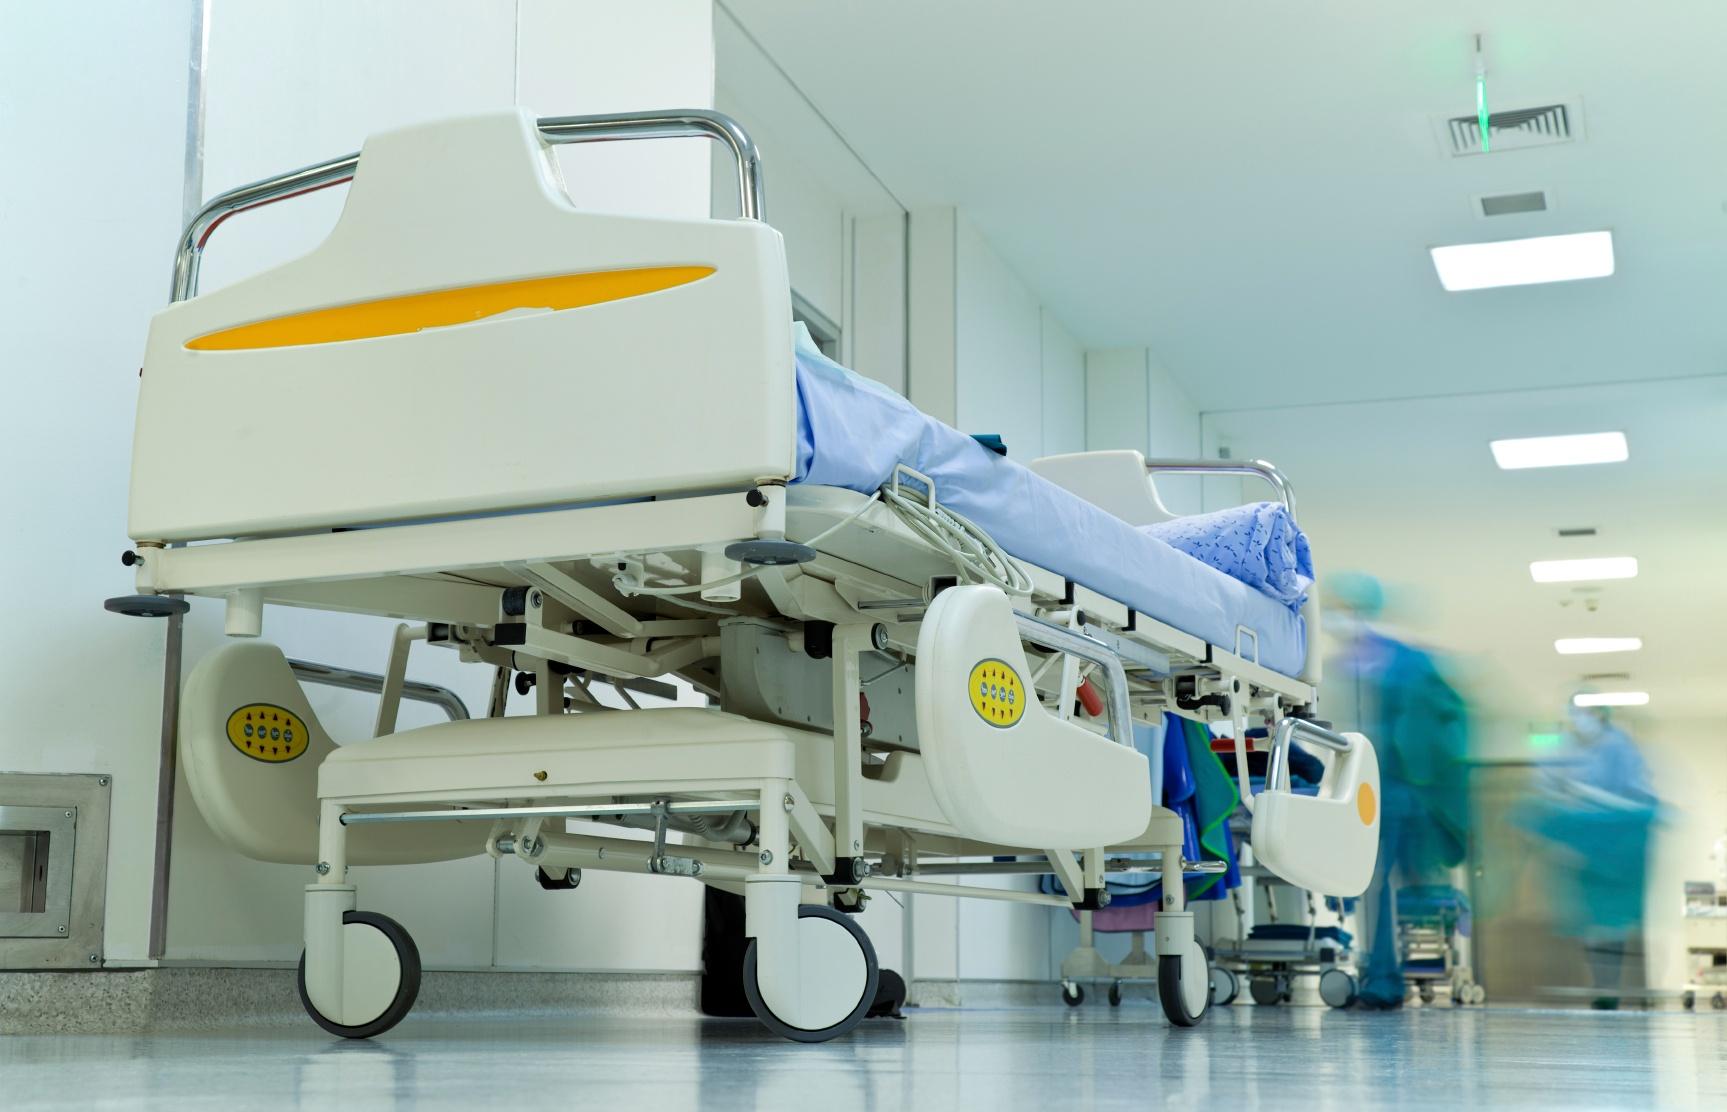 hospital_power_loss_medical_vacuum_failure